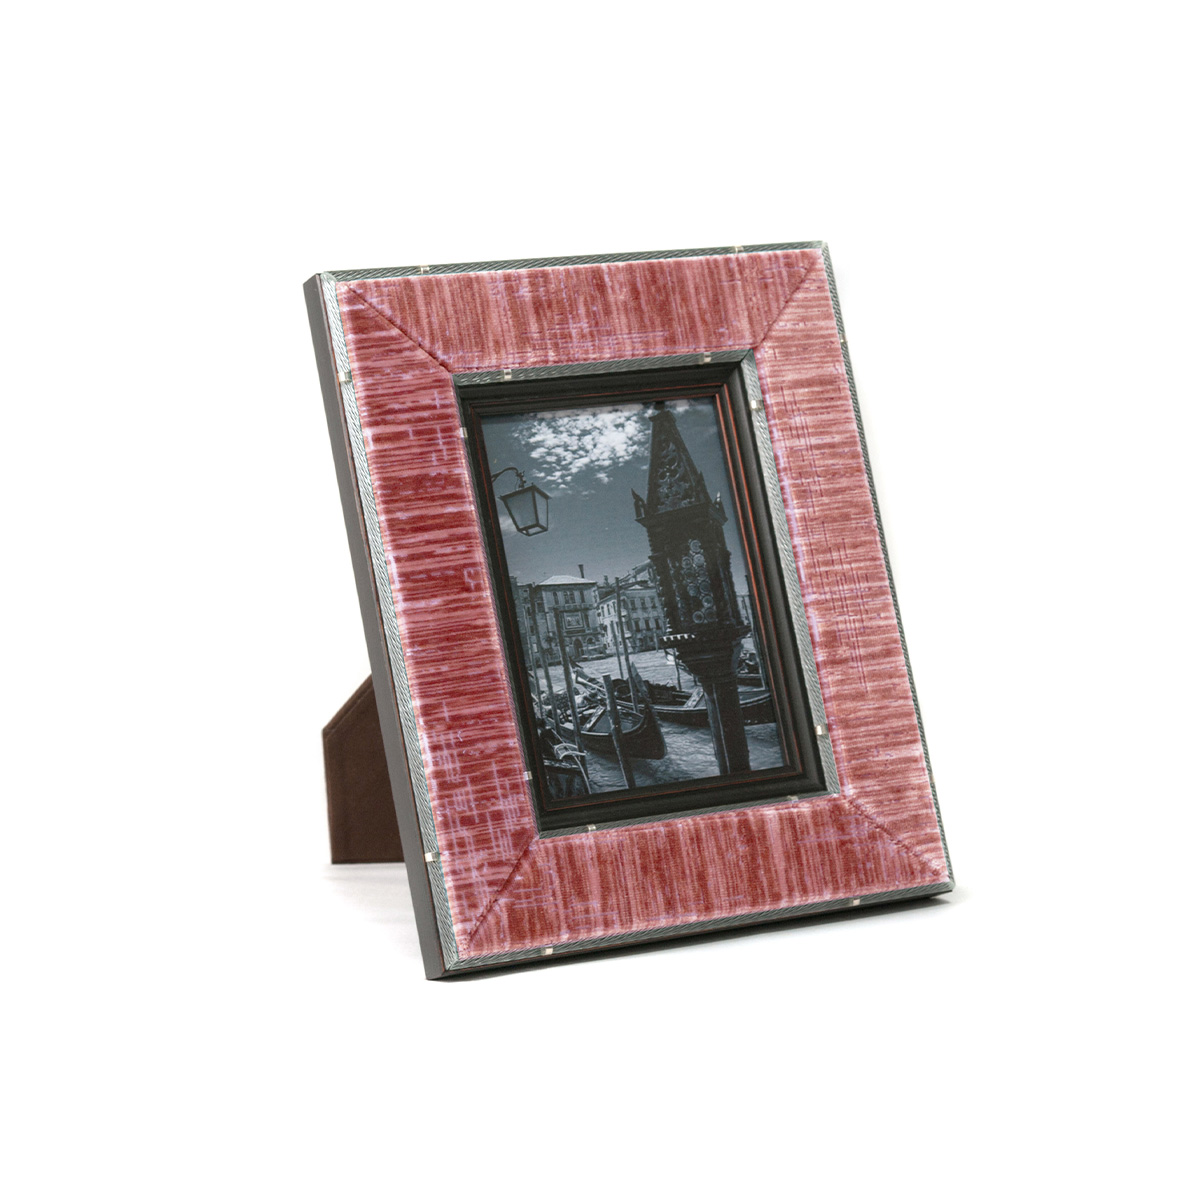 delfina_rose_frame_small_photograph_luxury_design_giberto_interior